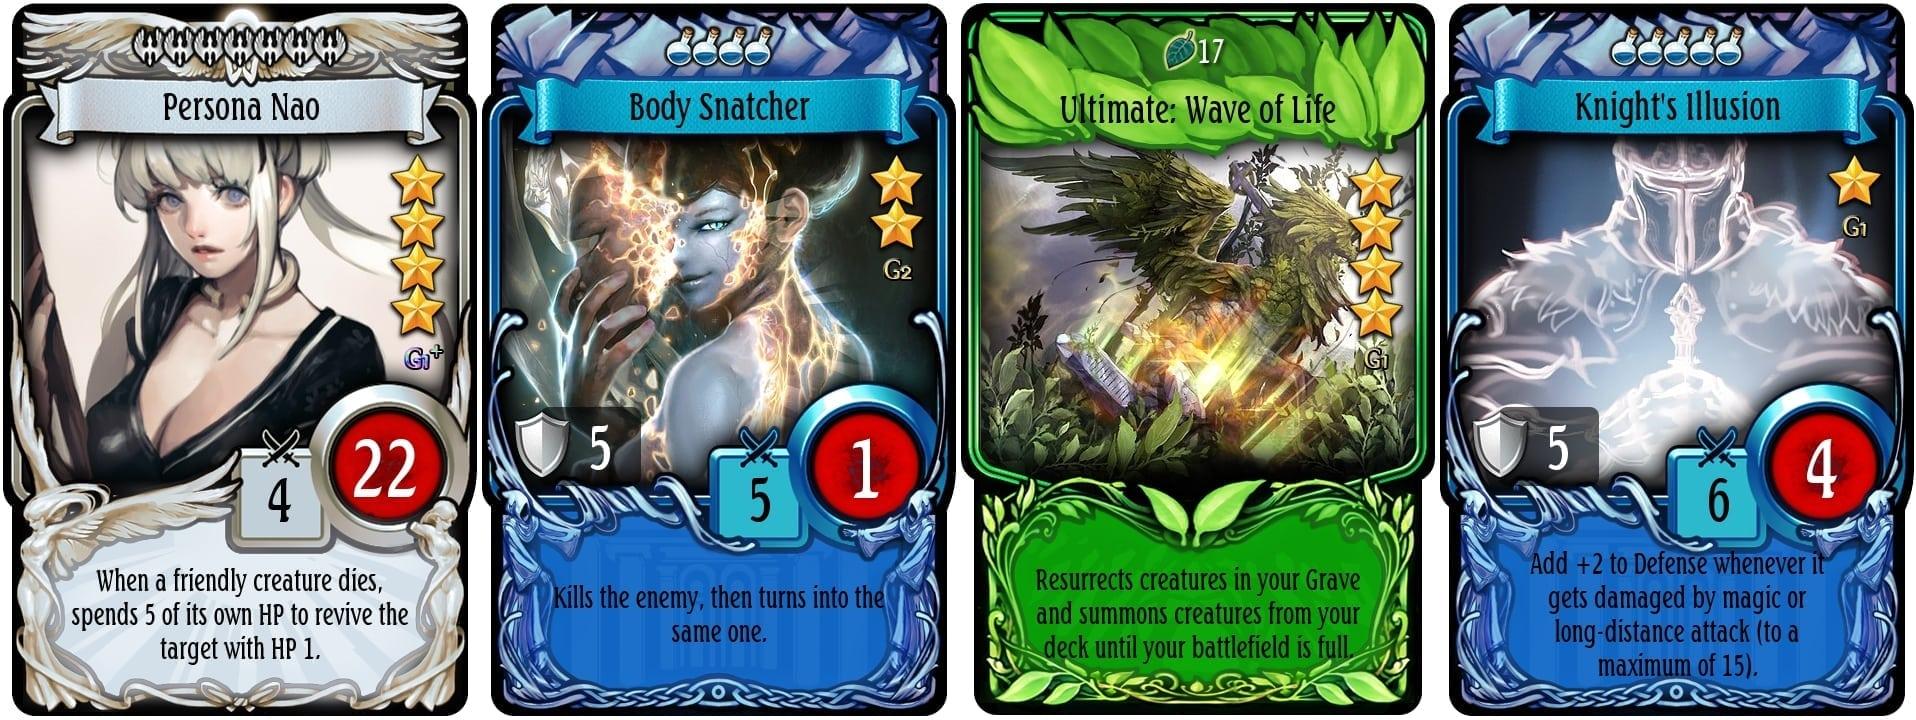 Mabinogi Duel - Card examples